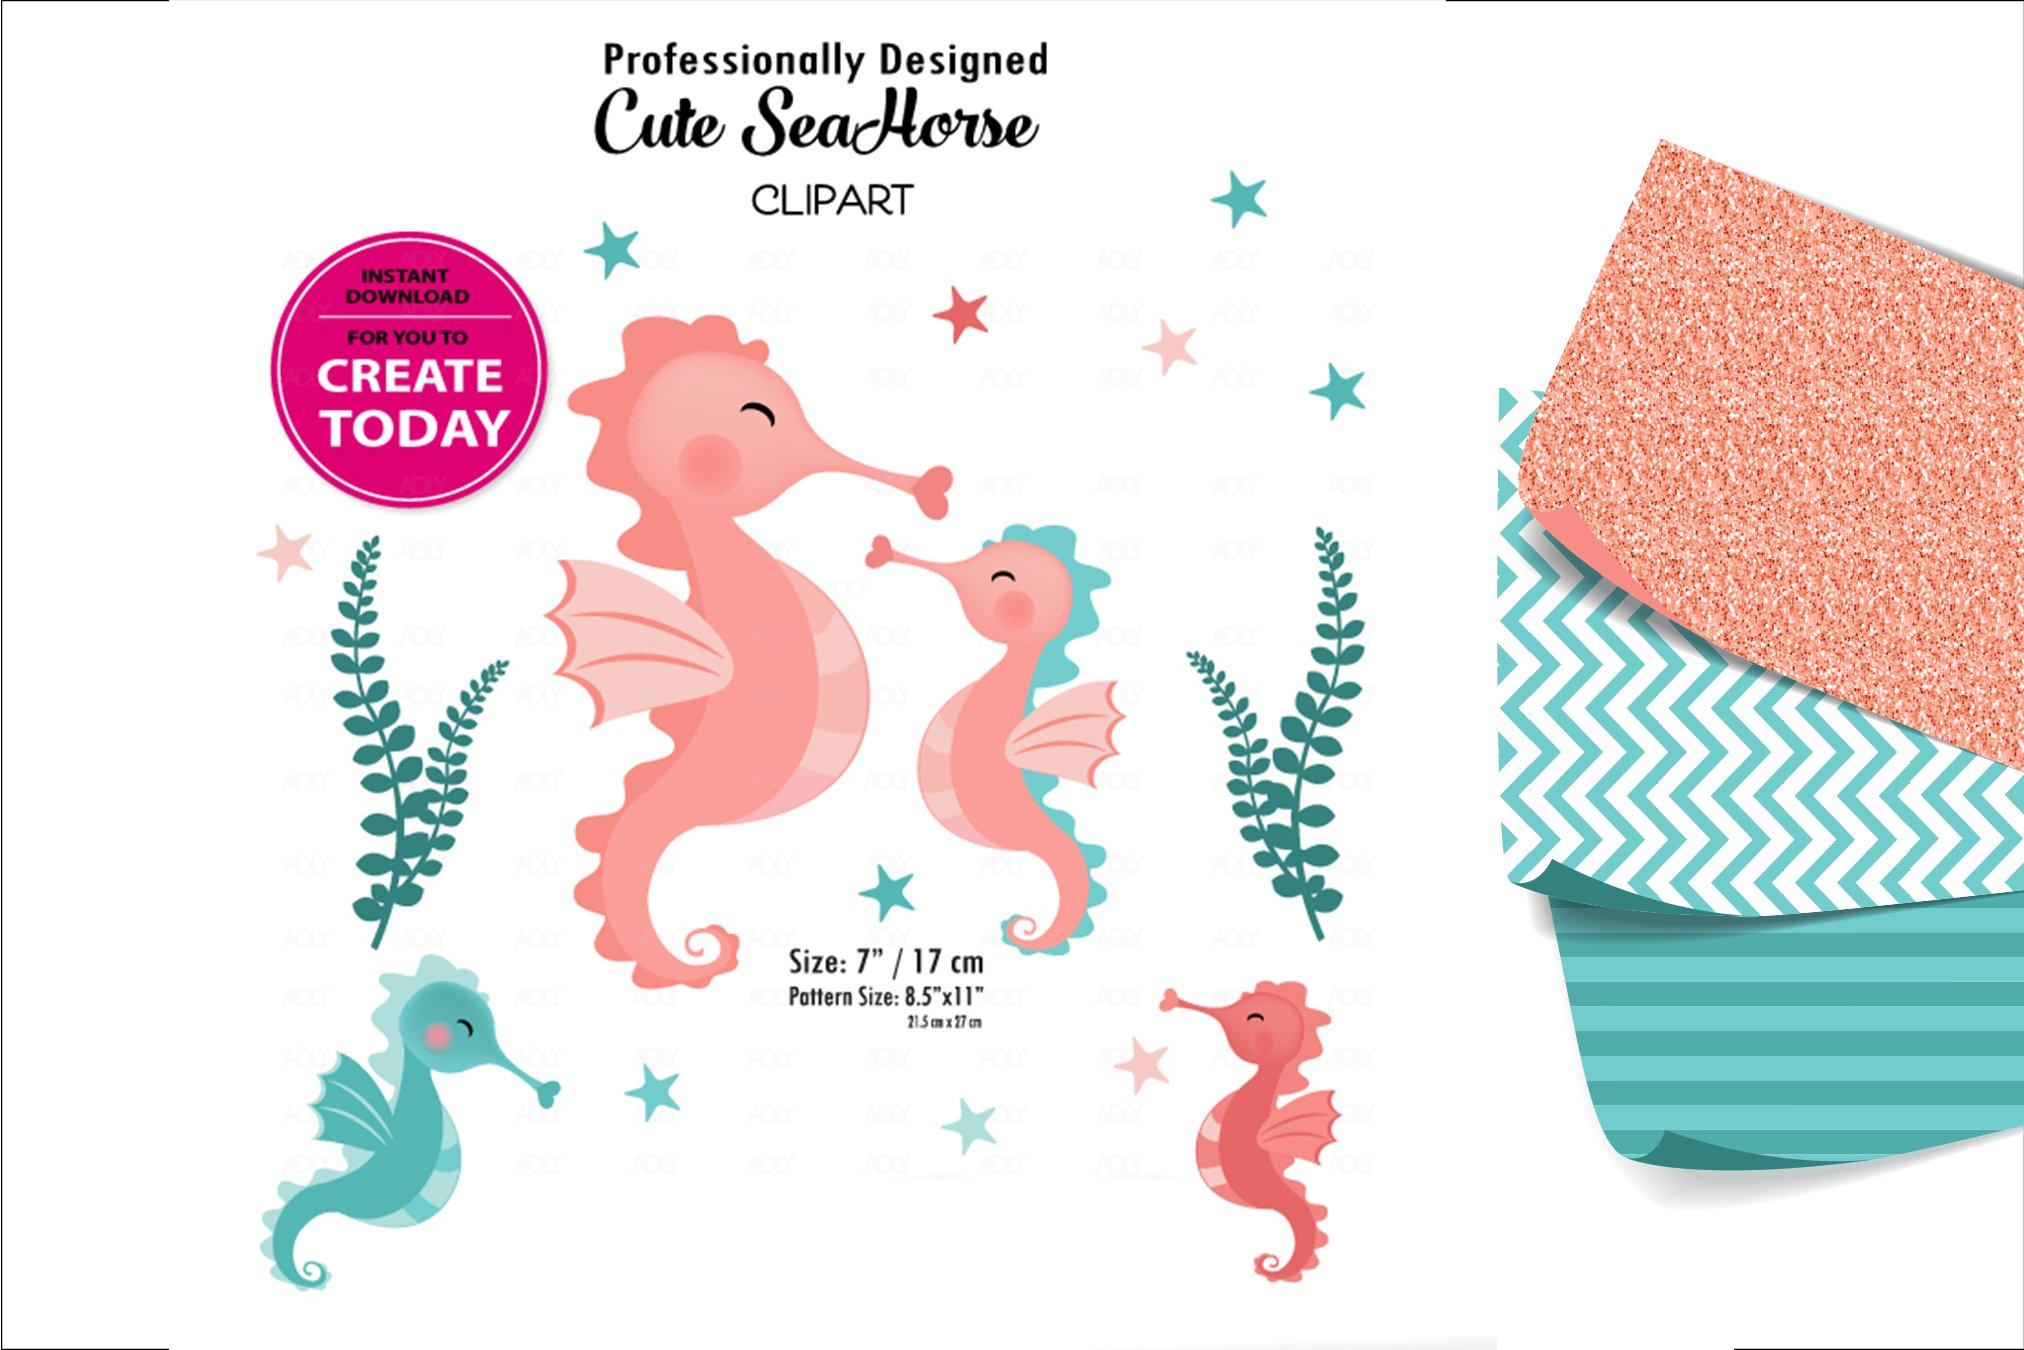 Little Baby Coral And Teal Seahorse Clip Art Design For Diy 362862 Illustrations Design Bundles